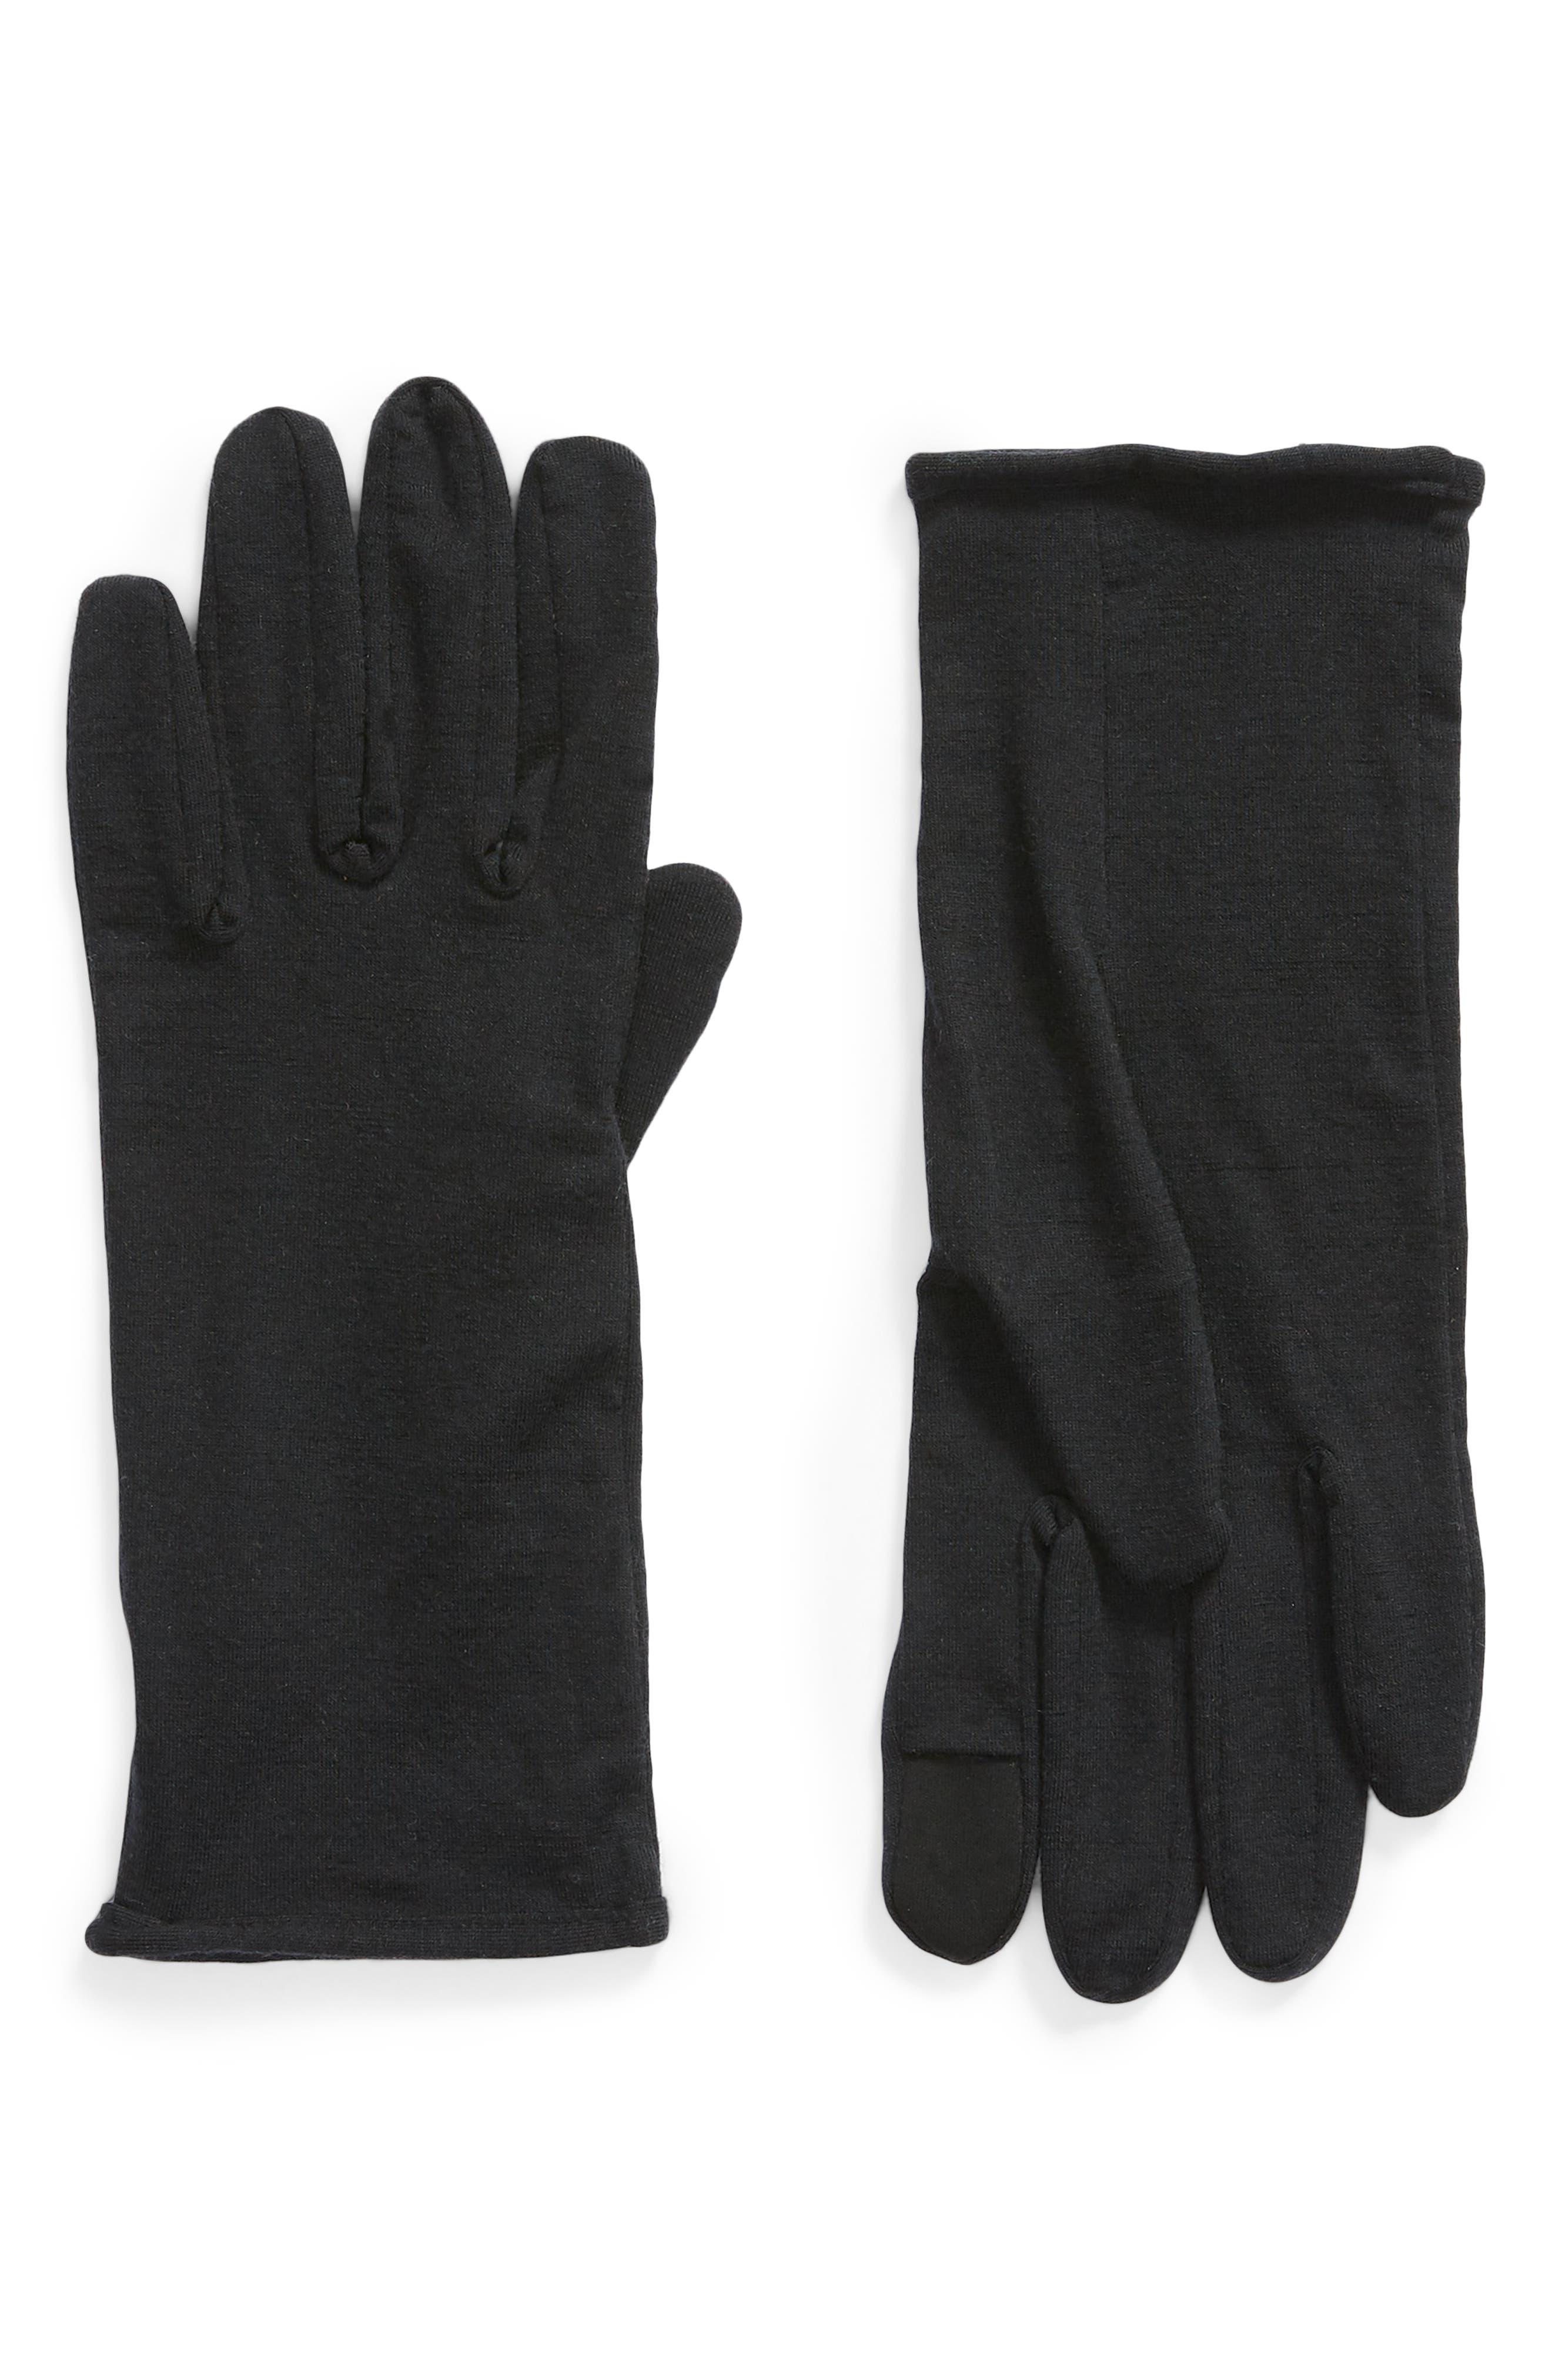 260 Tech Touchscreen Compatible Merino Wool Glove Liners